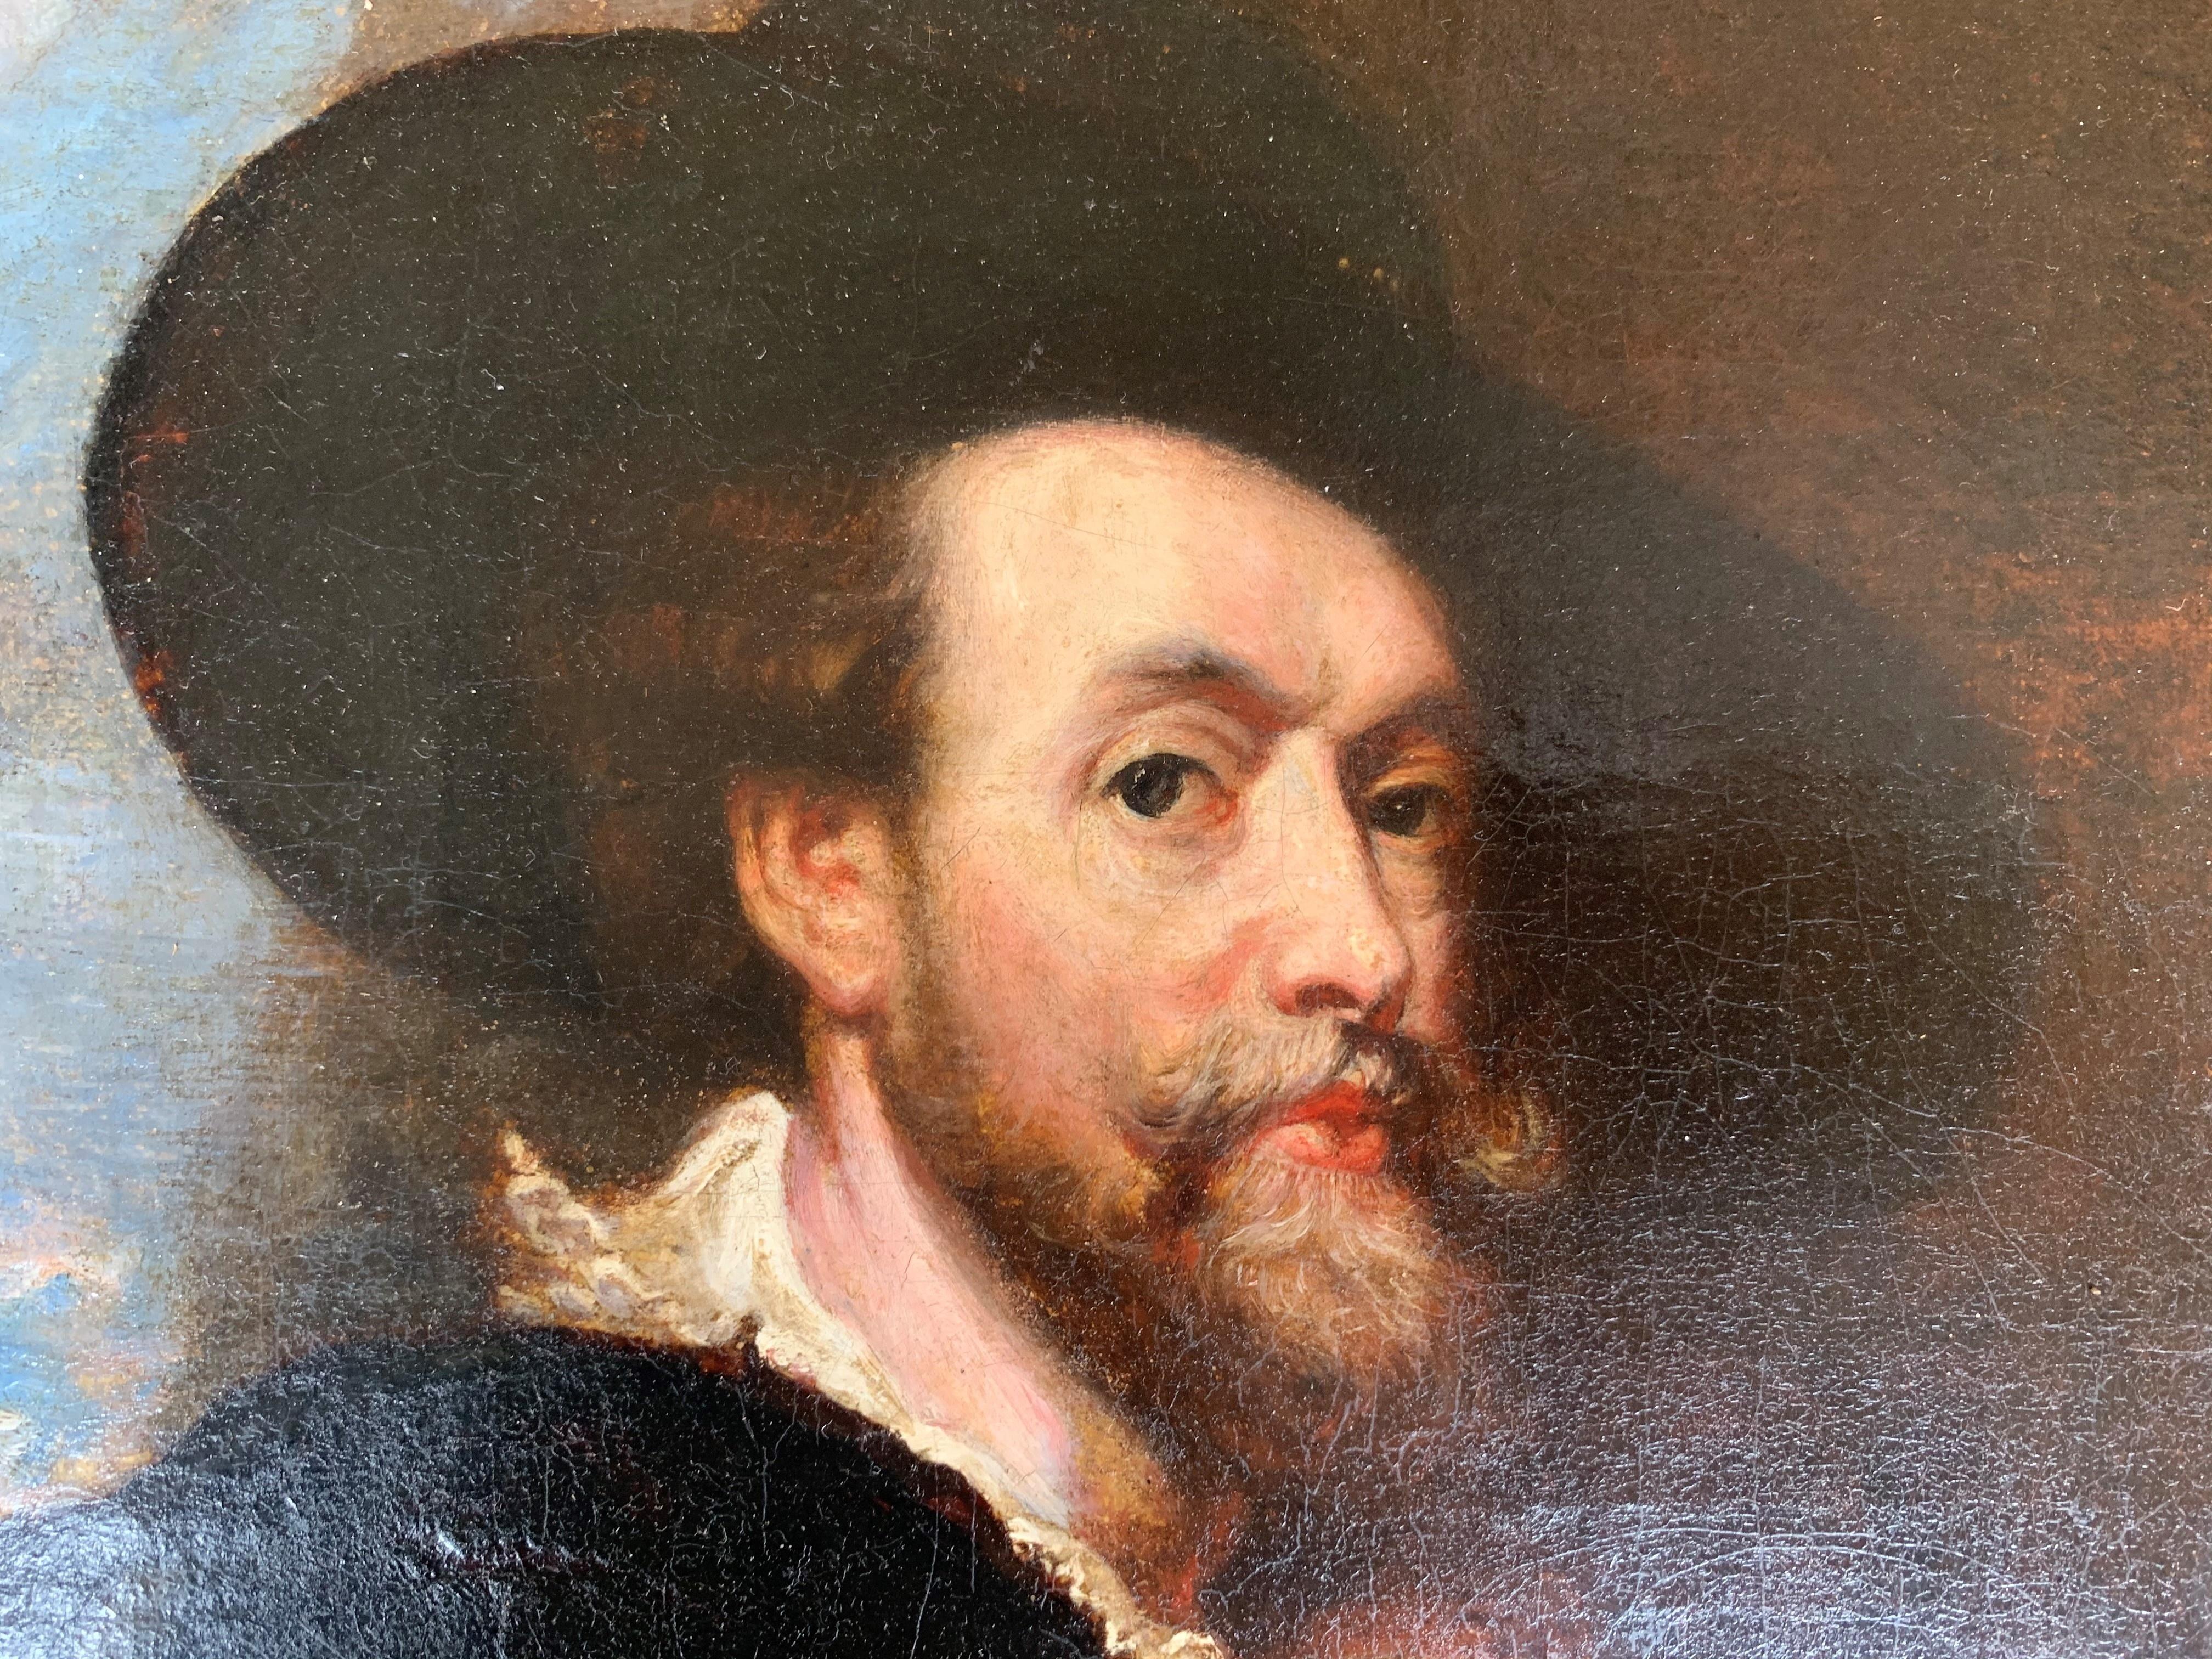 AFTER SIR PETER PAUL RUBENS, SIEGEN, 1577 - 1640, ANTWERP, 17TH CENTURY OIL ON CANVAS Self - Image 3 of 11